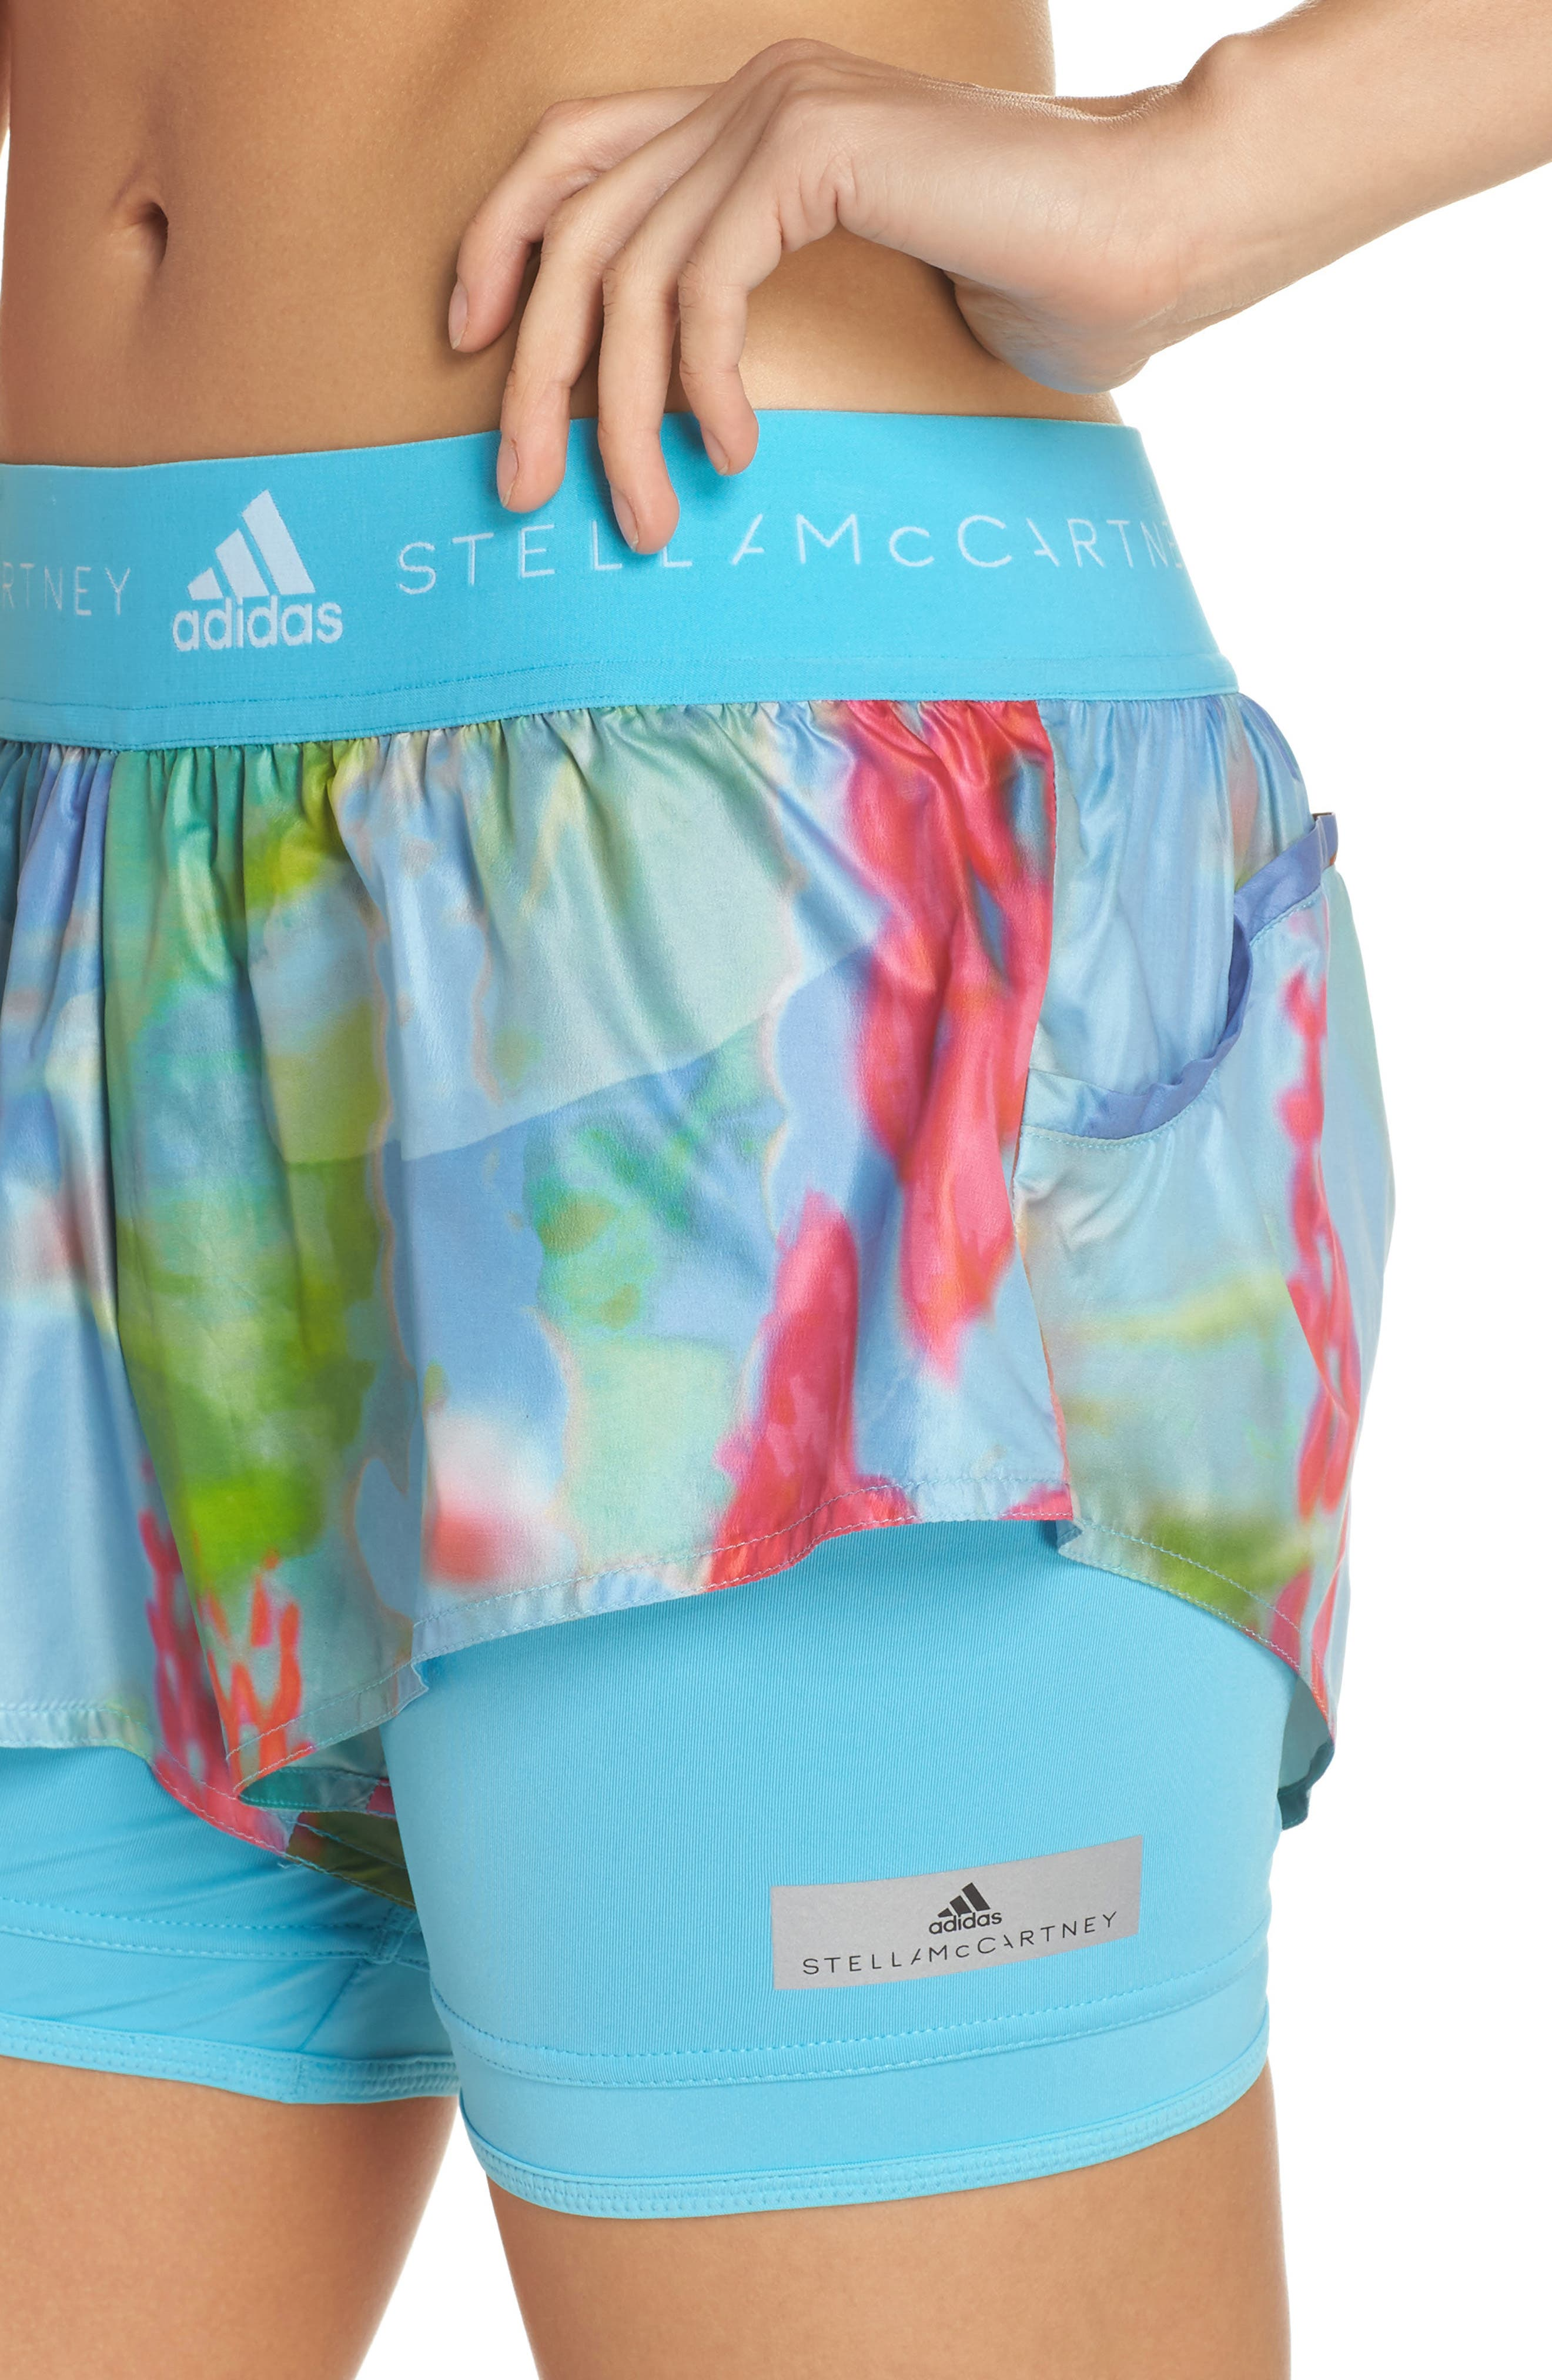 2-in-1 Run Shorts,                             Alternate thumbnail 4, color,                             Mirror Blue-Smc/ Multicolor